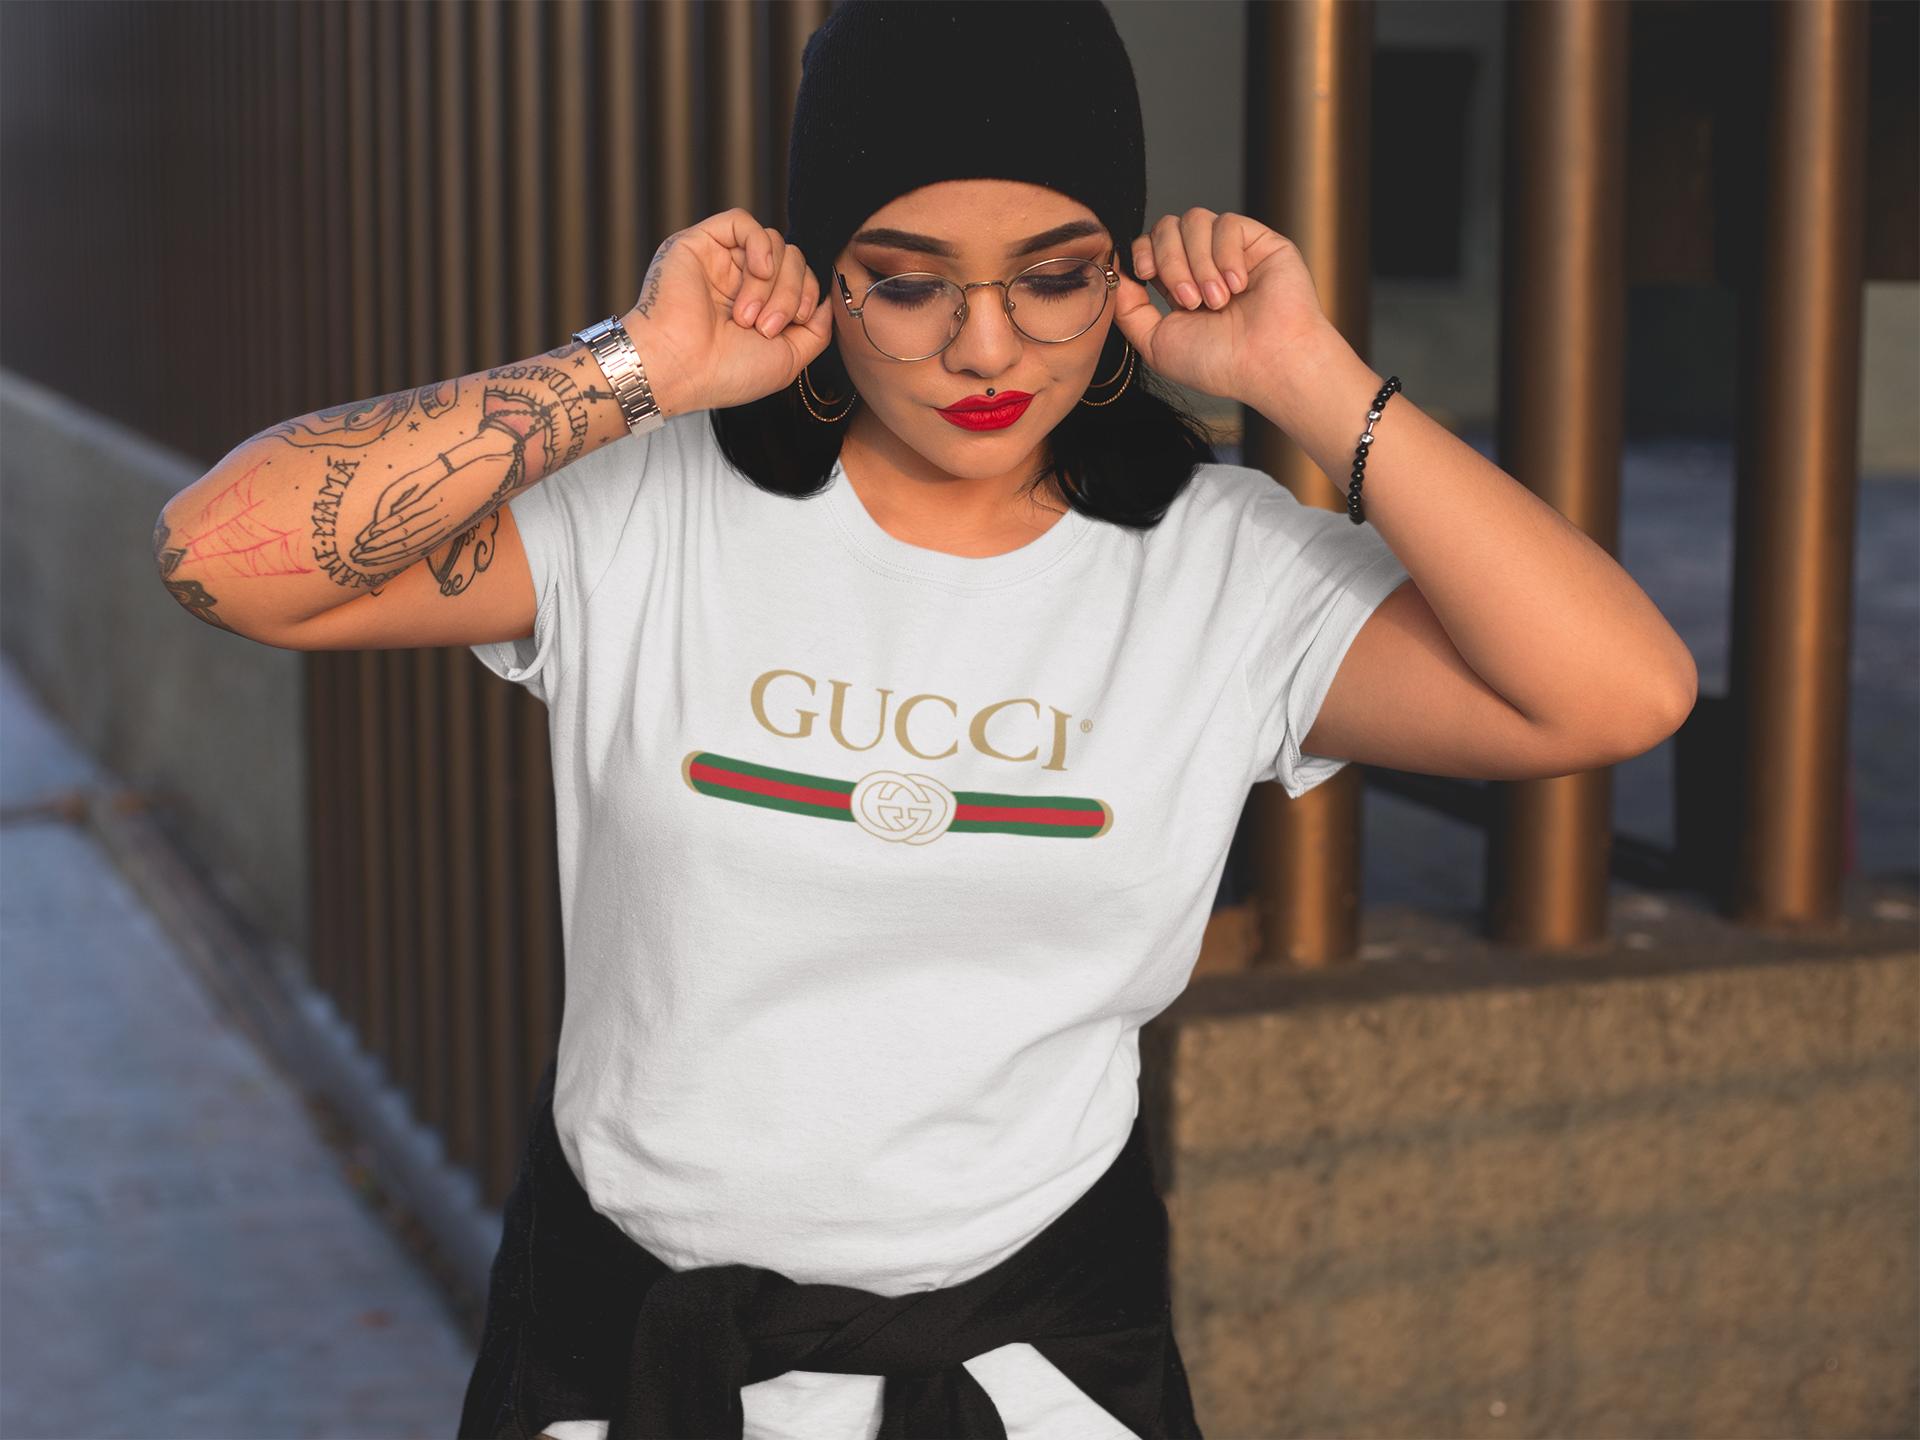 b36fa75eac4 Gucci Shirt - Gucci Vintage - Gucci Tshirt - Gucci Inspired - Mens Tshirt -  Womens Tshirt - Designer Inspired - Gucci Unisex White Tshirt